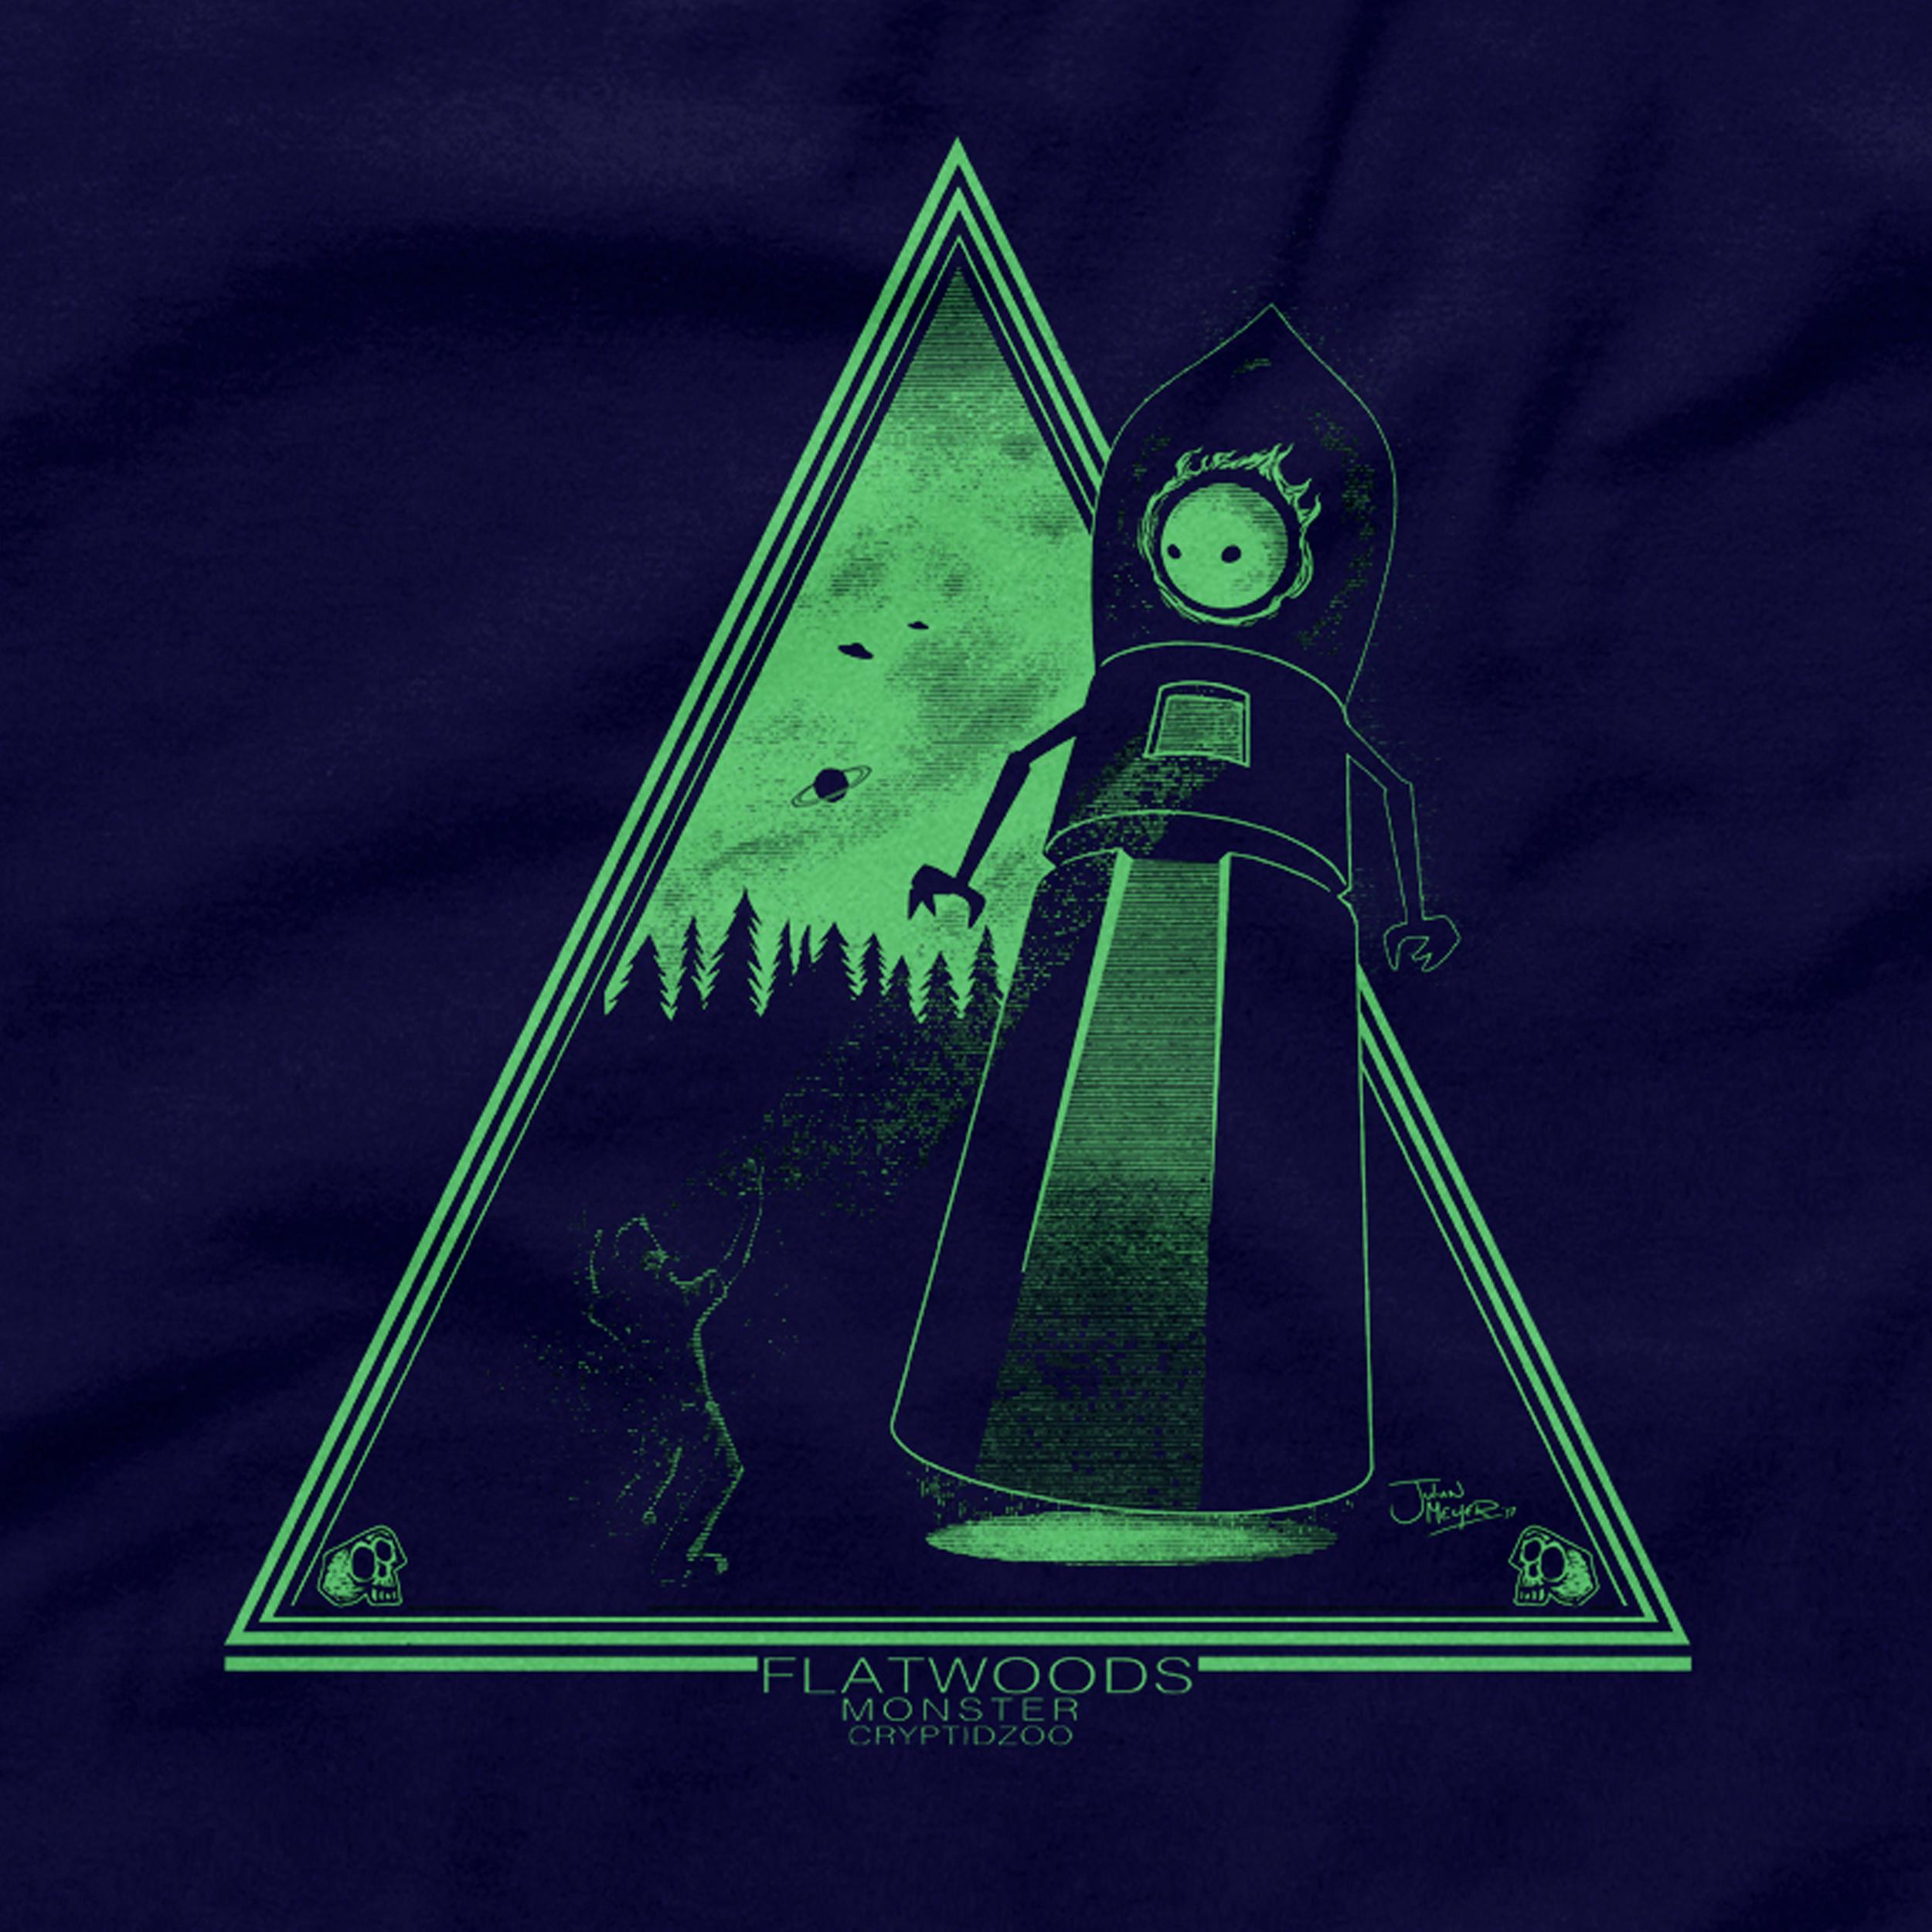 T-Shirt Mockup Flatwood_clsup.jpg